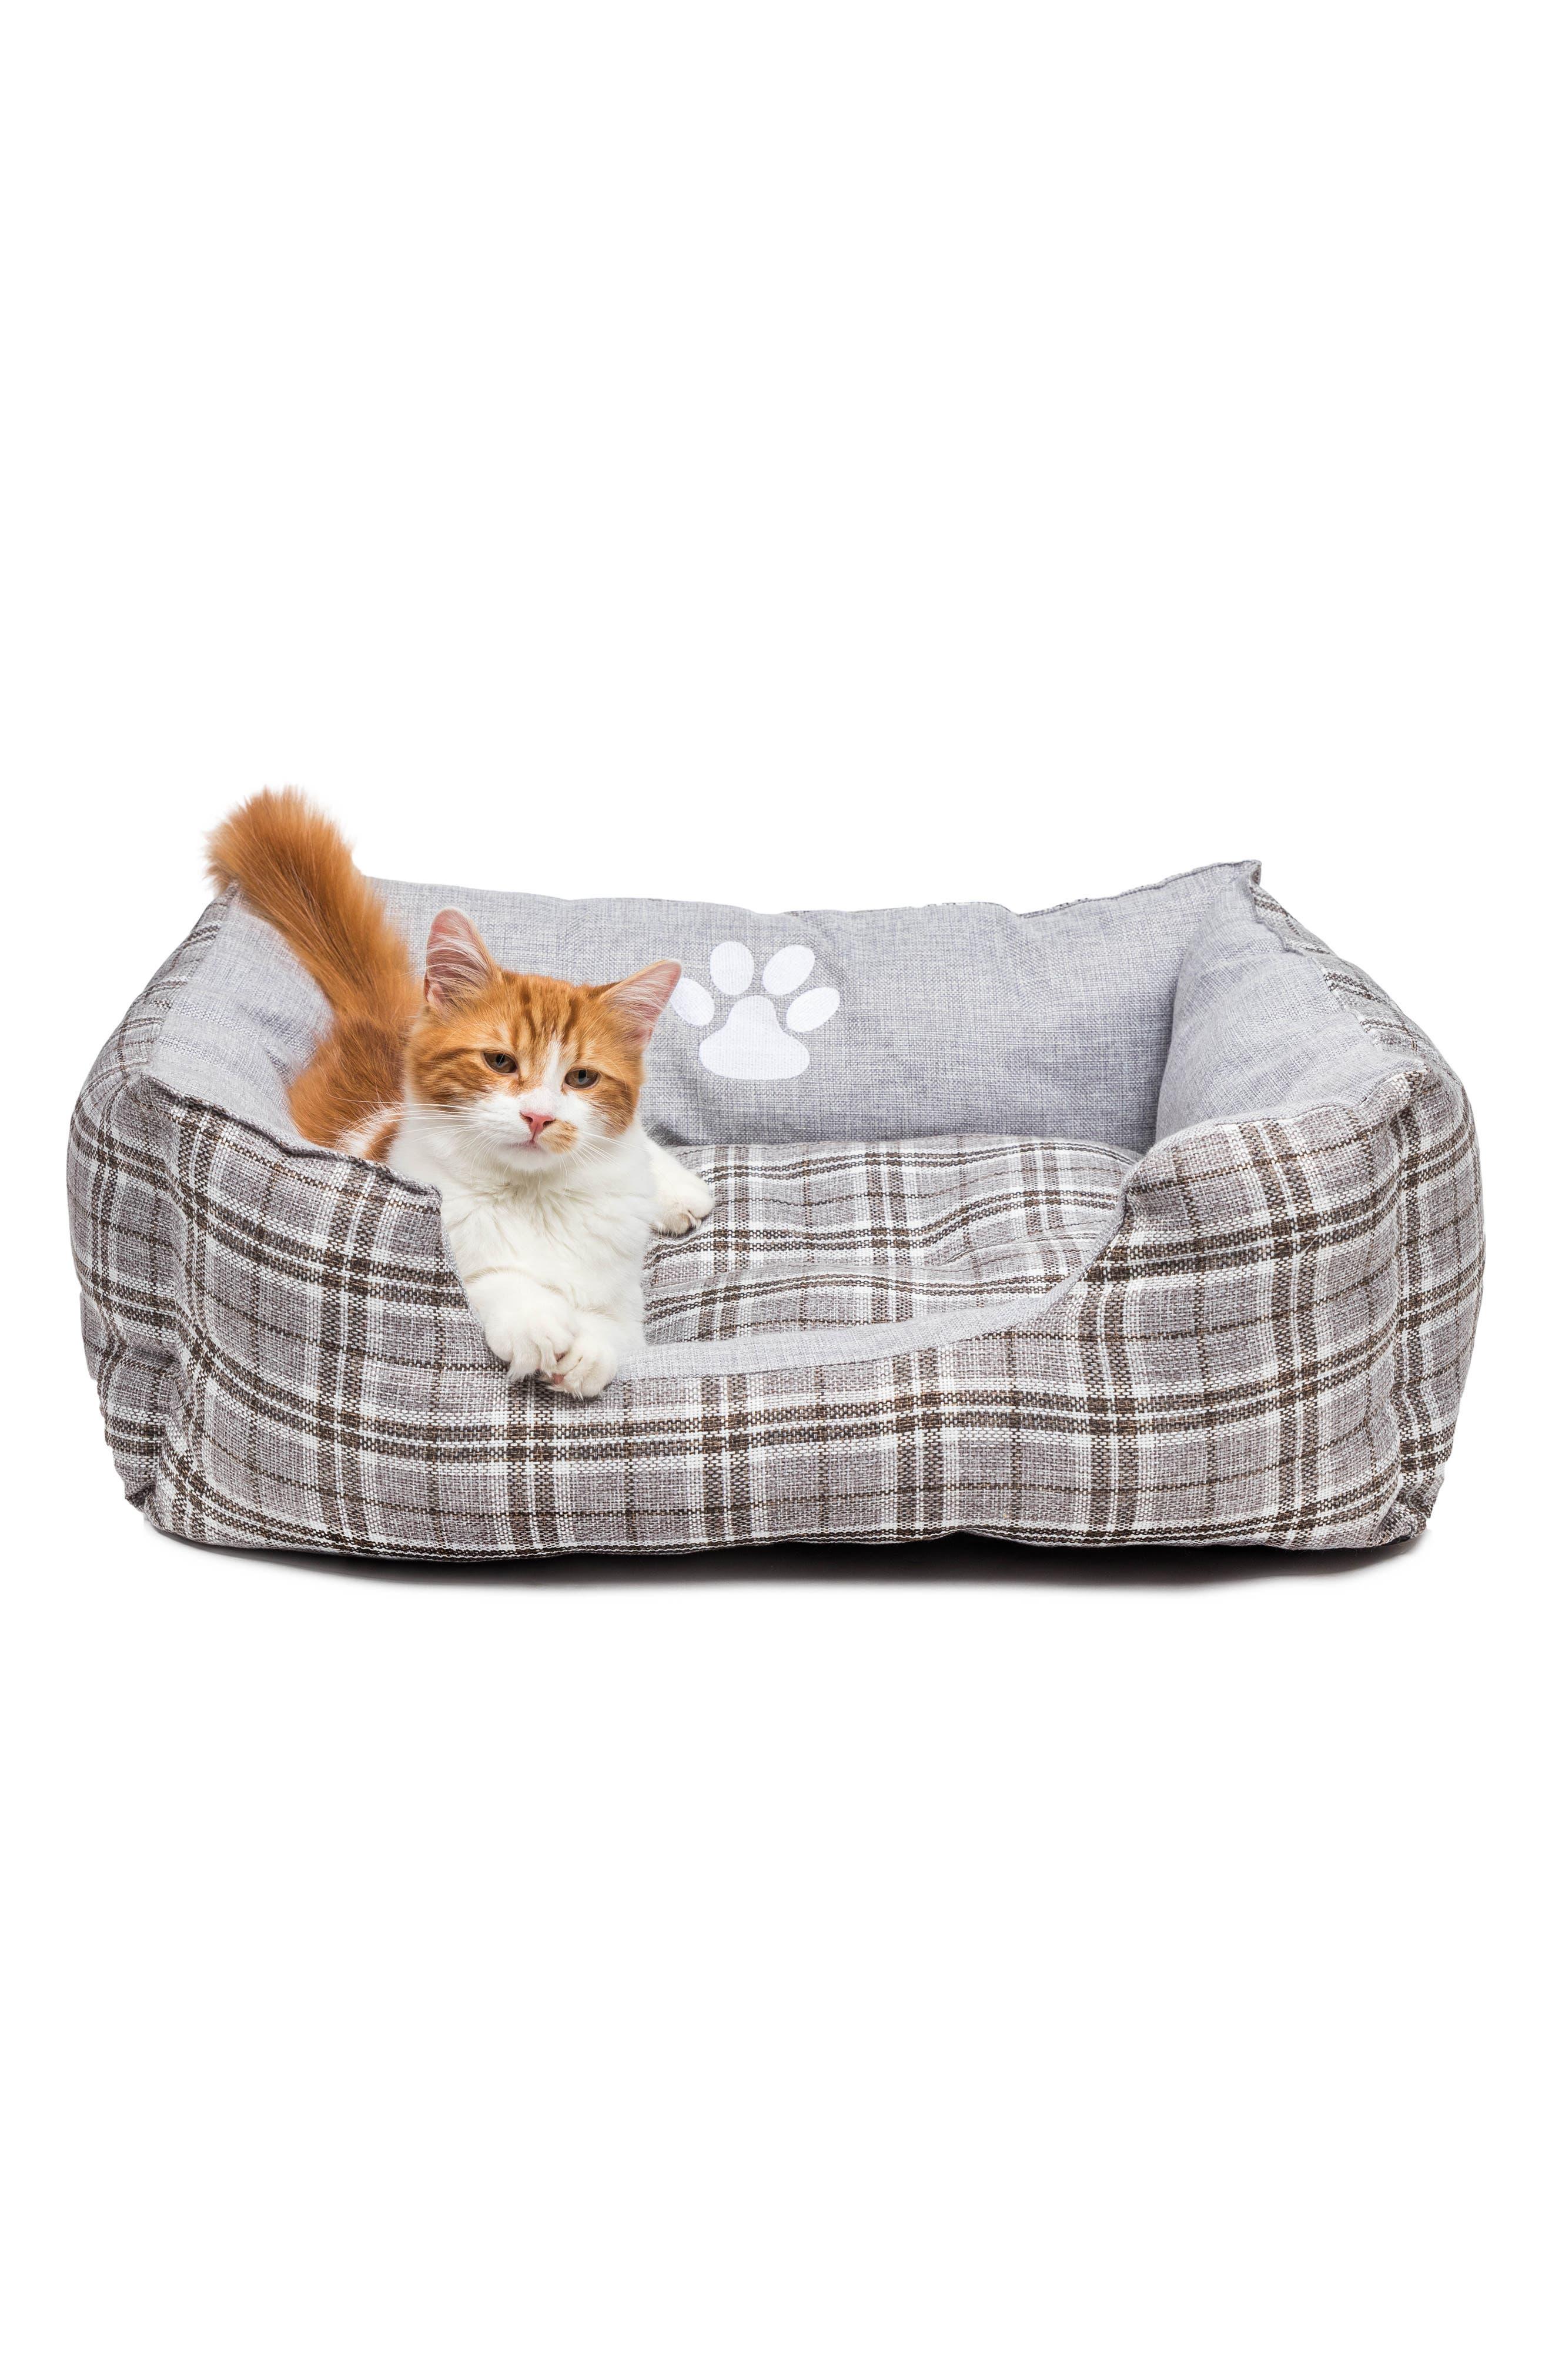 Harlee Large Square Pet Bed,                             Alternate thumbnail 2, color,                             Grey